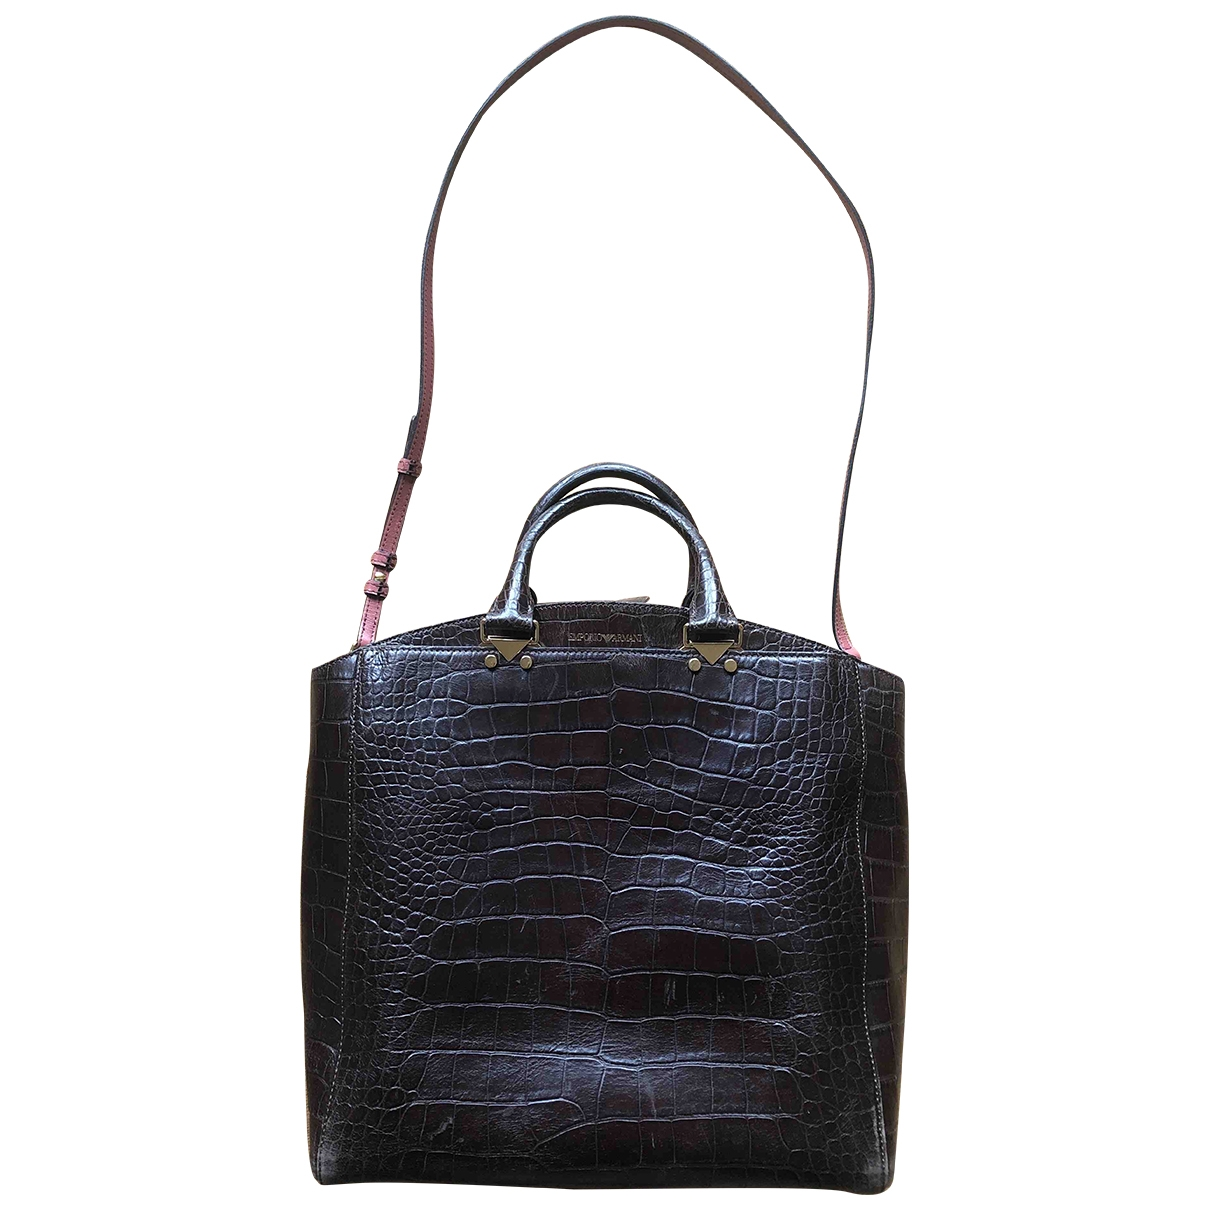 Emporio Armani \N Brown Leather handbag for Women \N